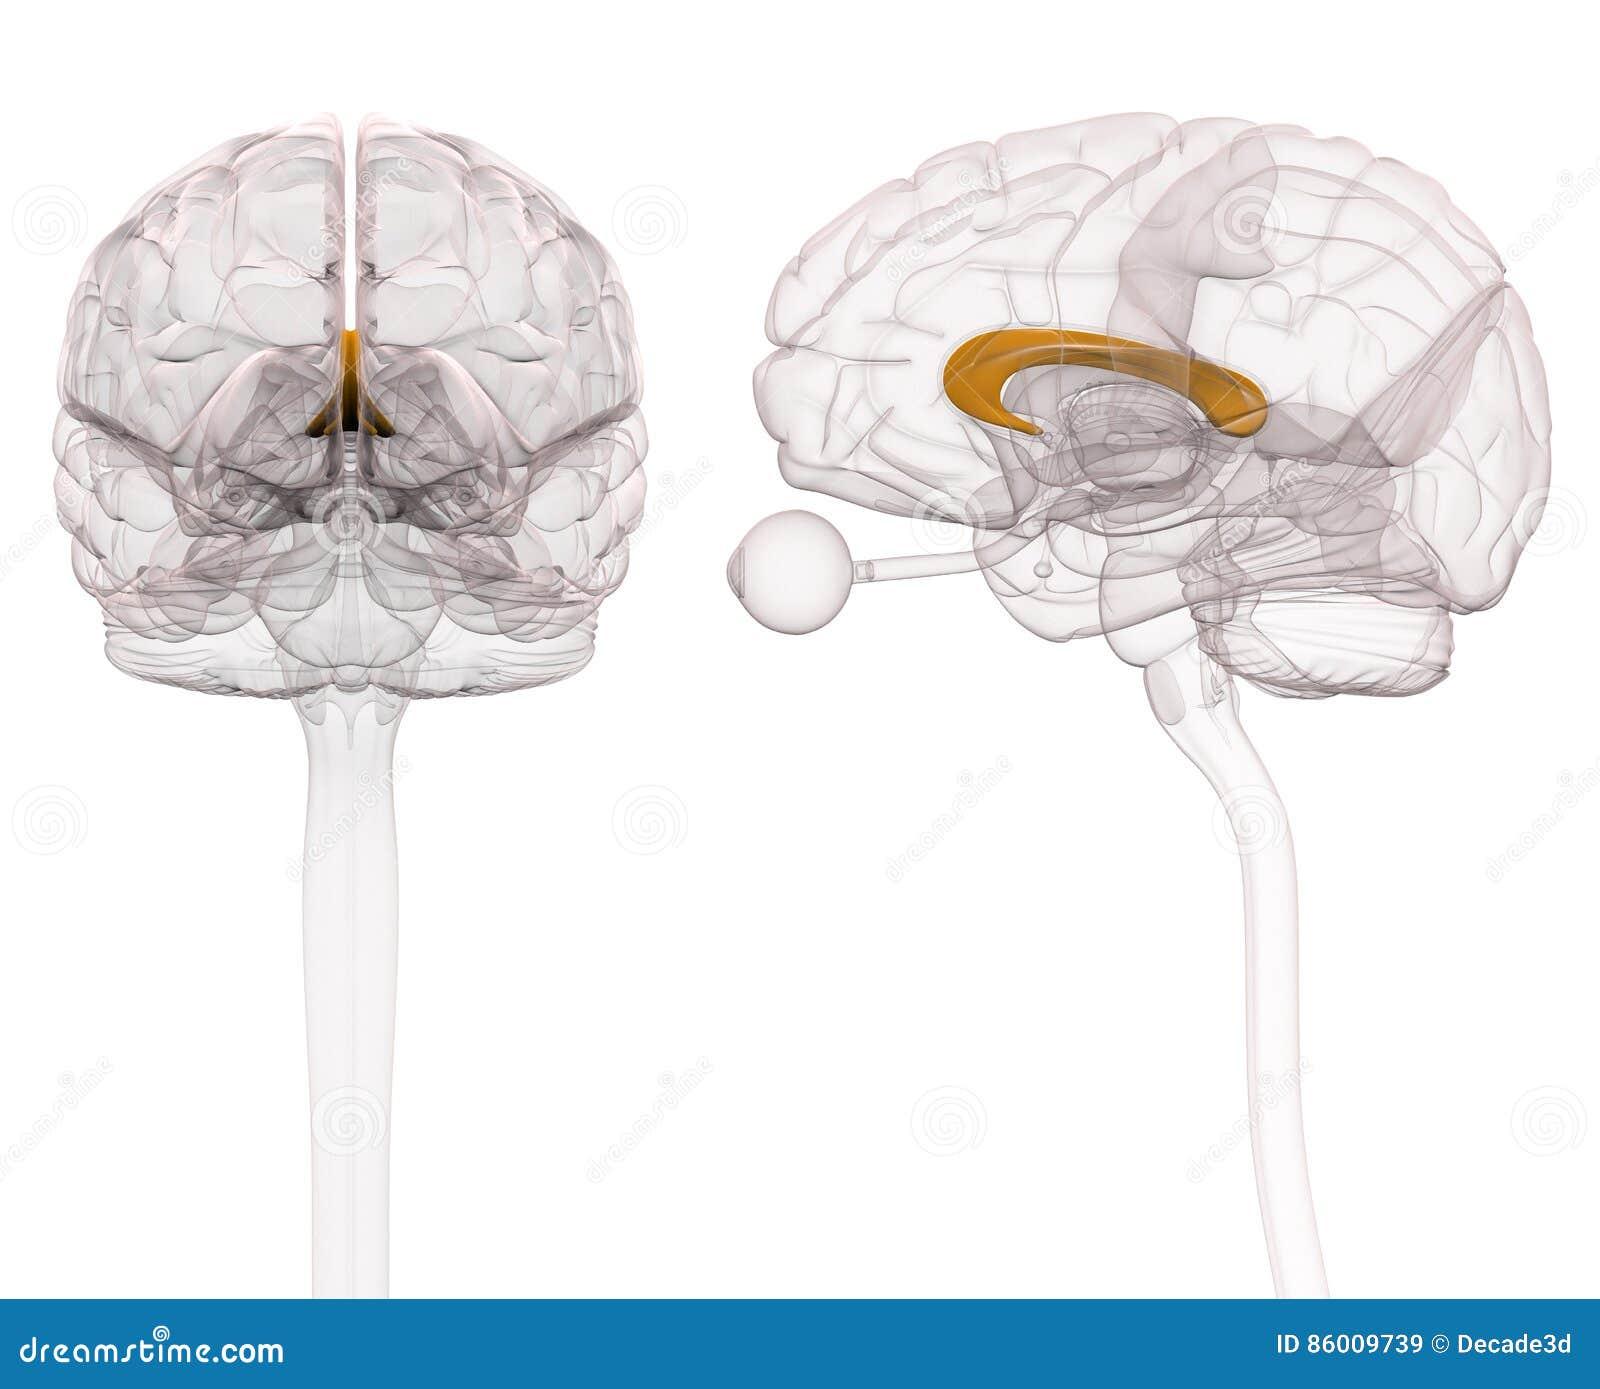 Korpus Callosum Brain Anatomy Illustration 3d Stock Abbildung